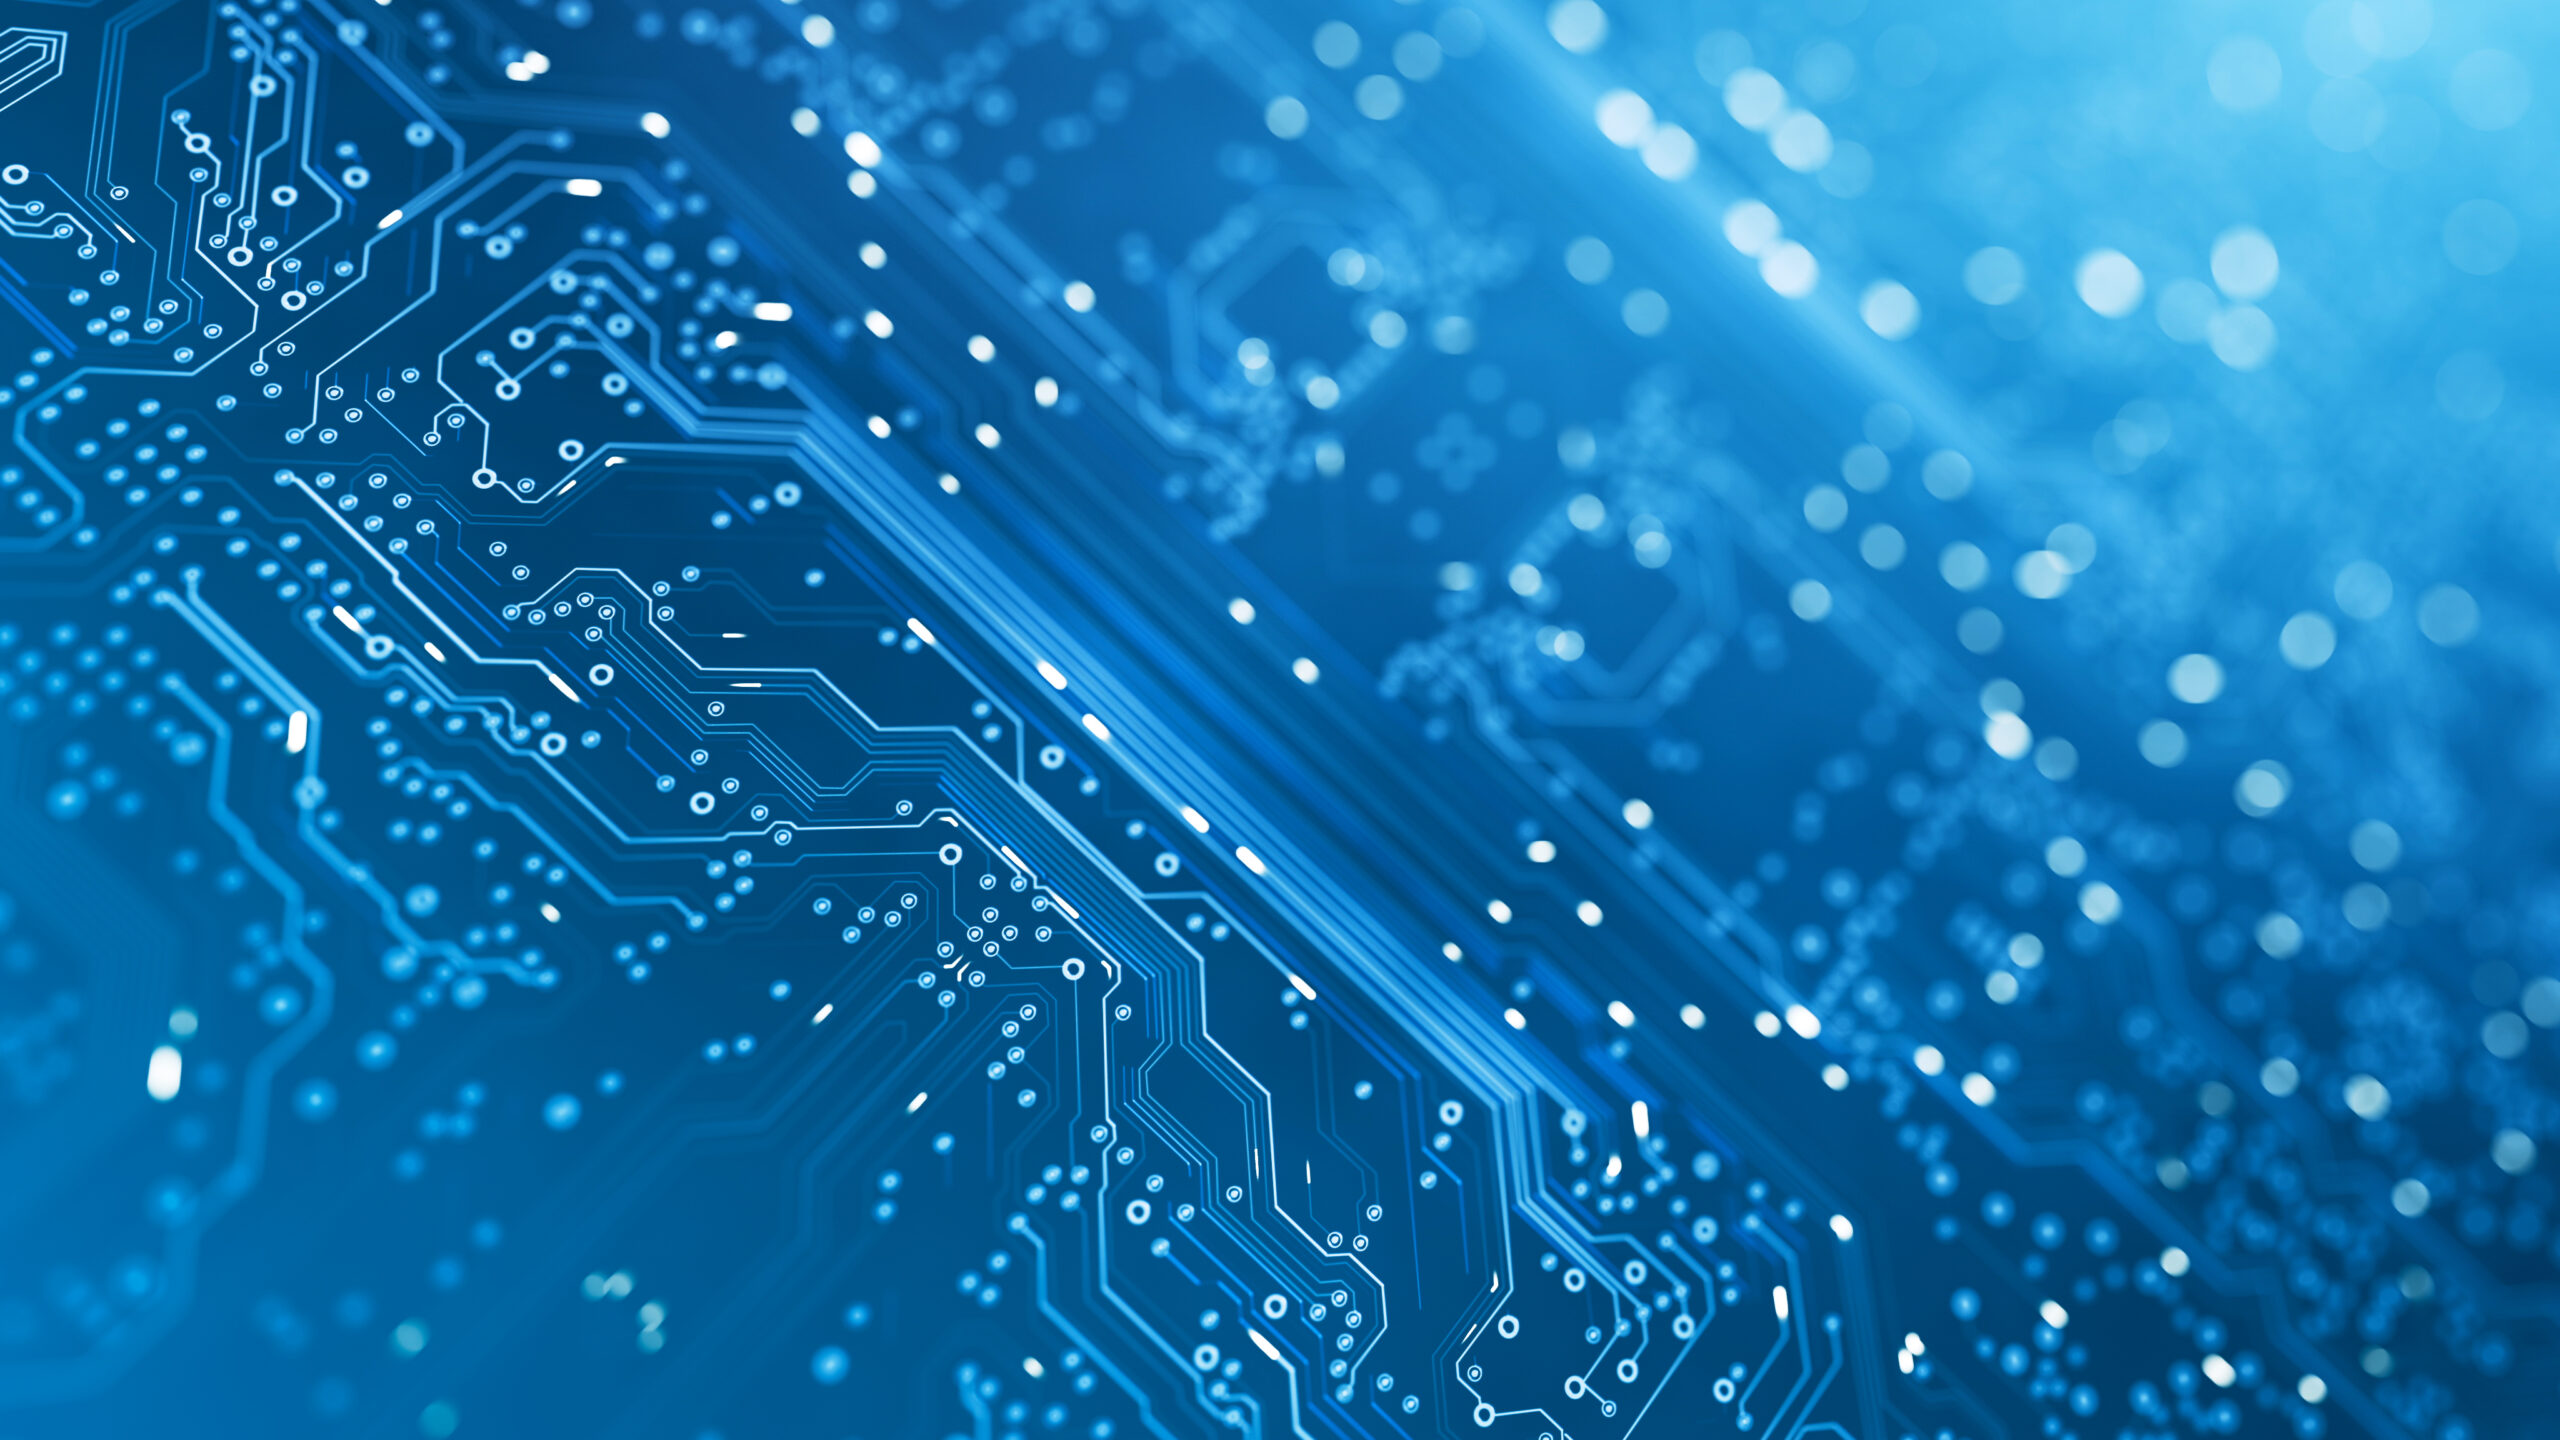 Circuit Board - Blue - Computer, Data, Technology, Artificial Intelligence